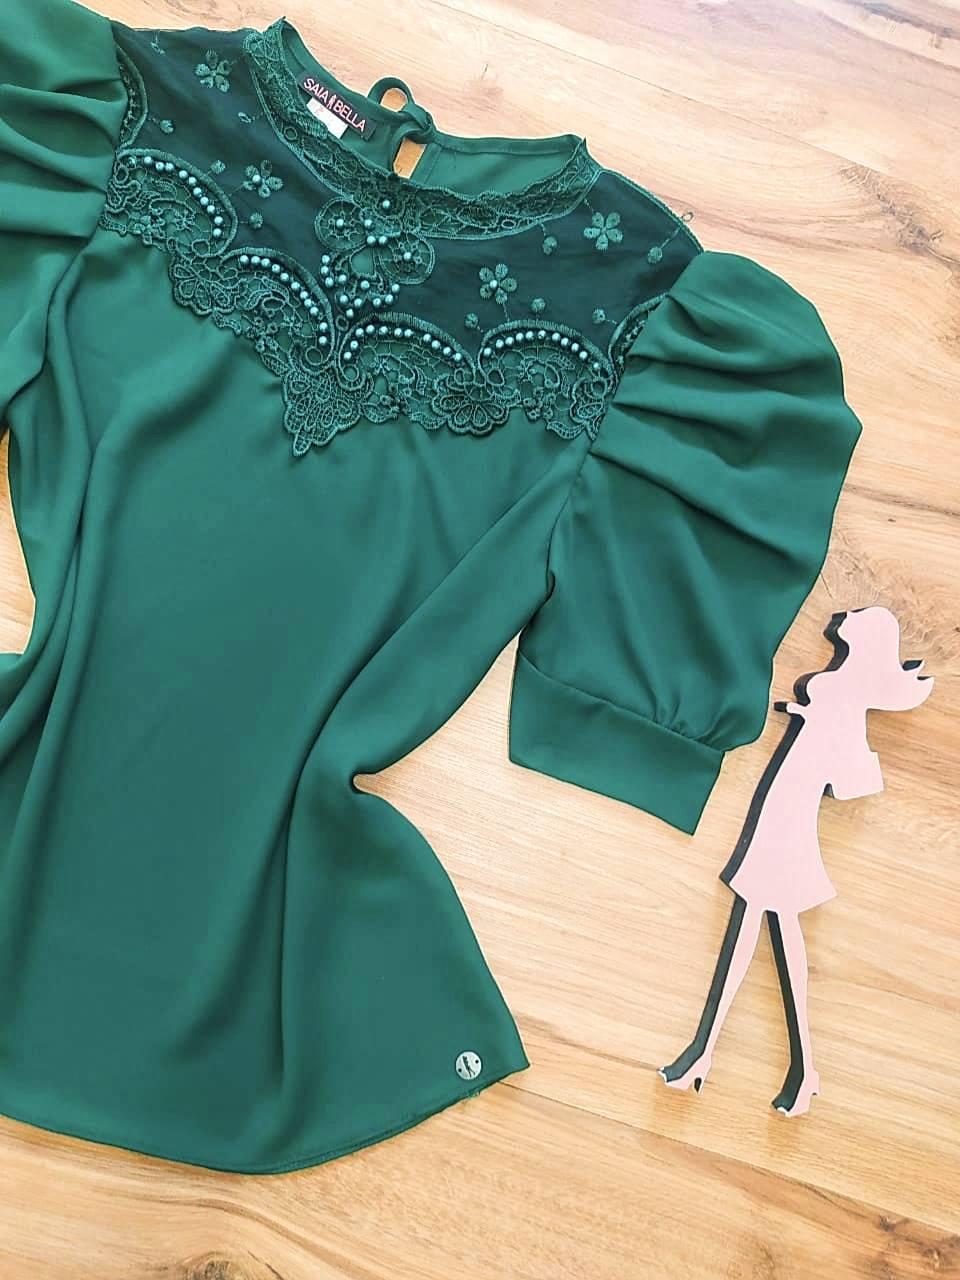 Blusa Dianna de Renda Saia Bella - SB840700 - Verde